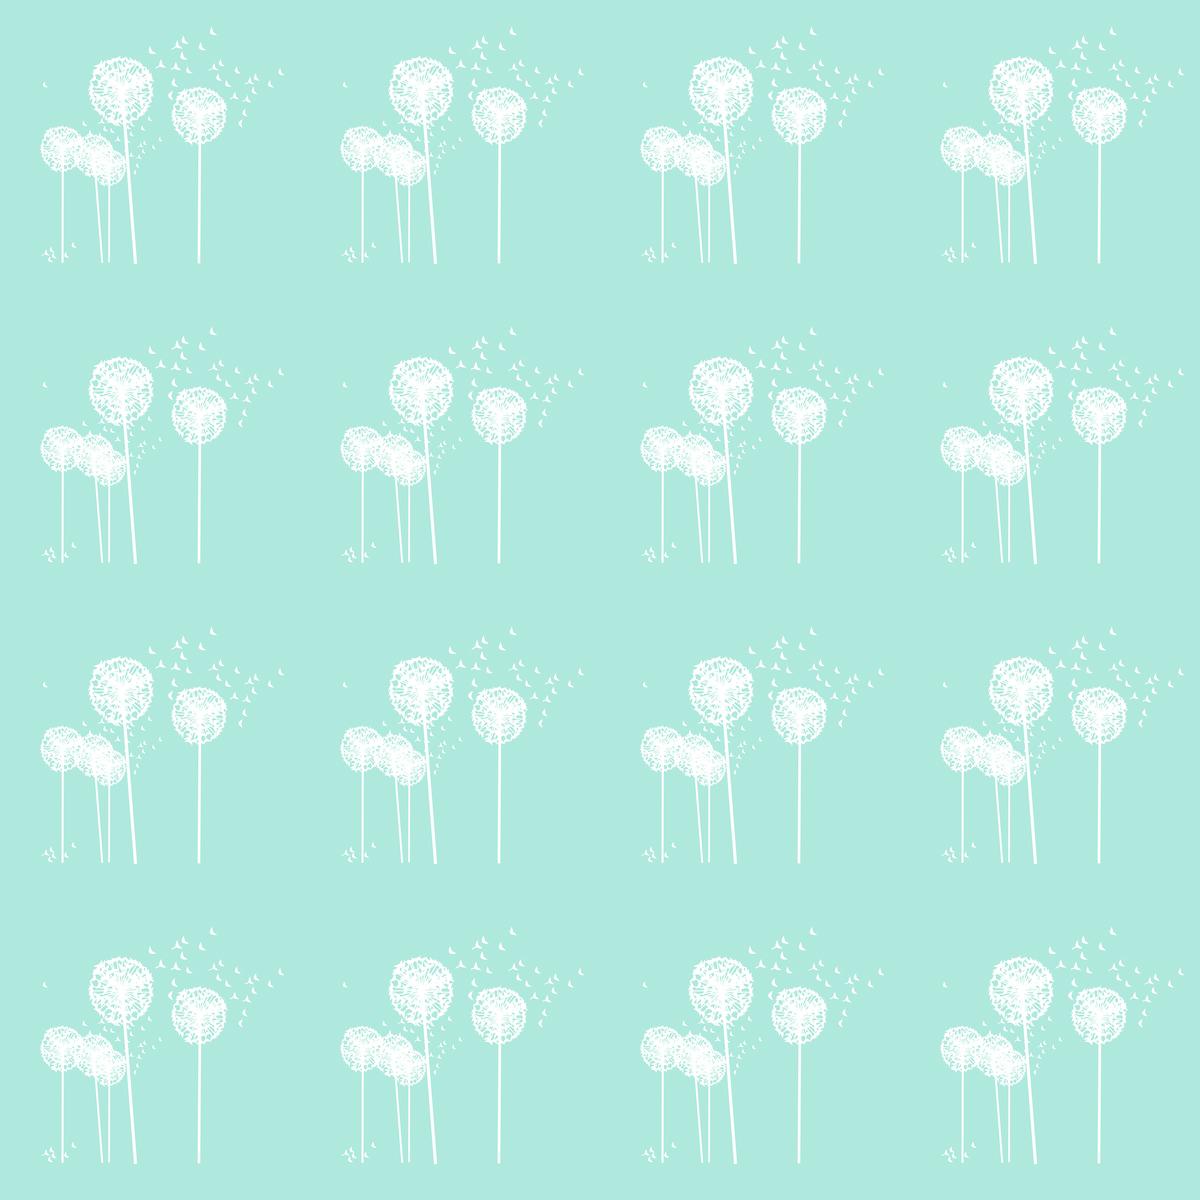 free digital mint dandelion scrapbooking paper ausdruckbares geschenkpapier freebie. Black Bedroom Furniture Sets. Home Design Ideas